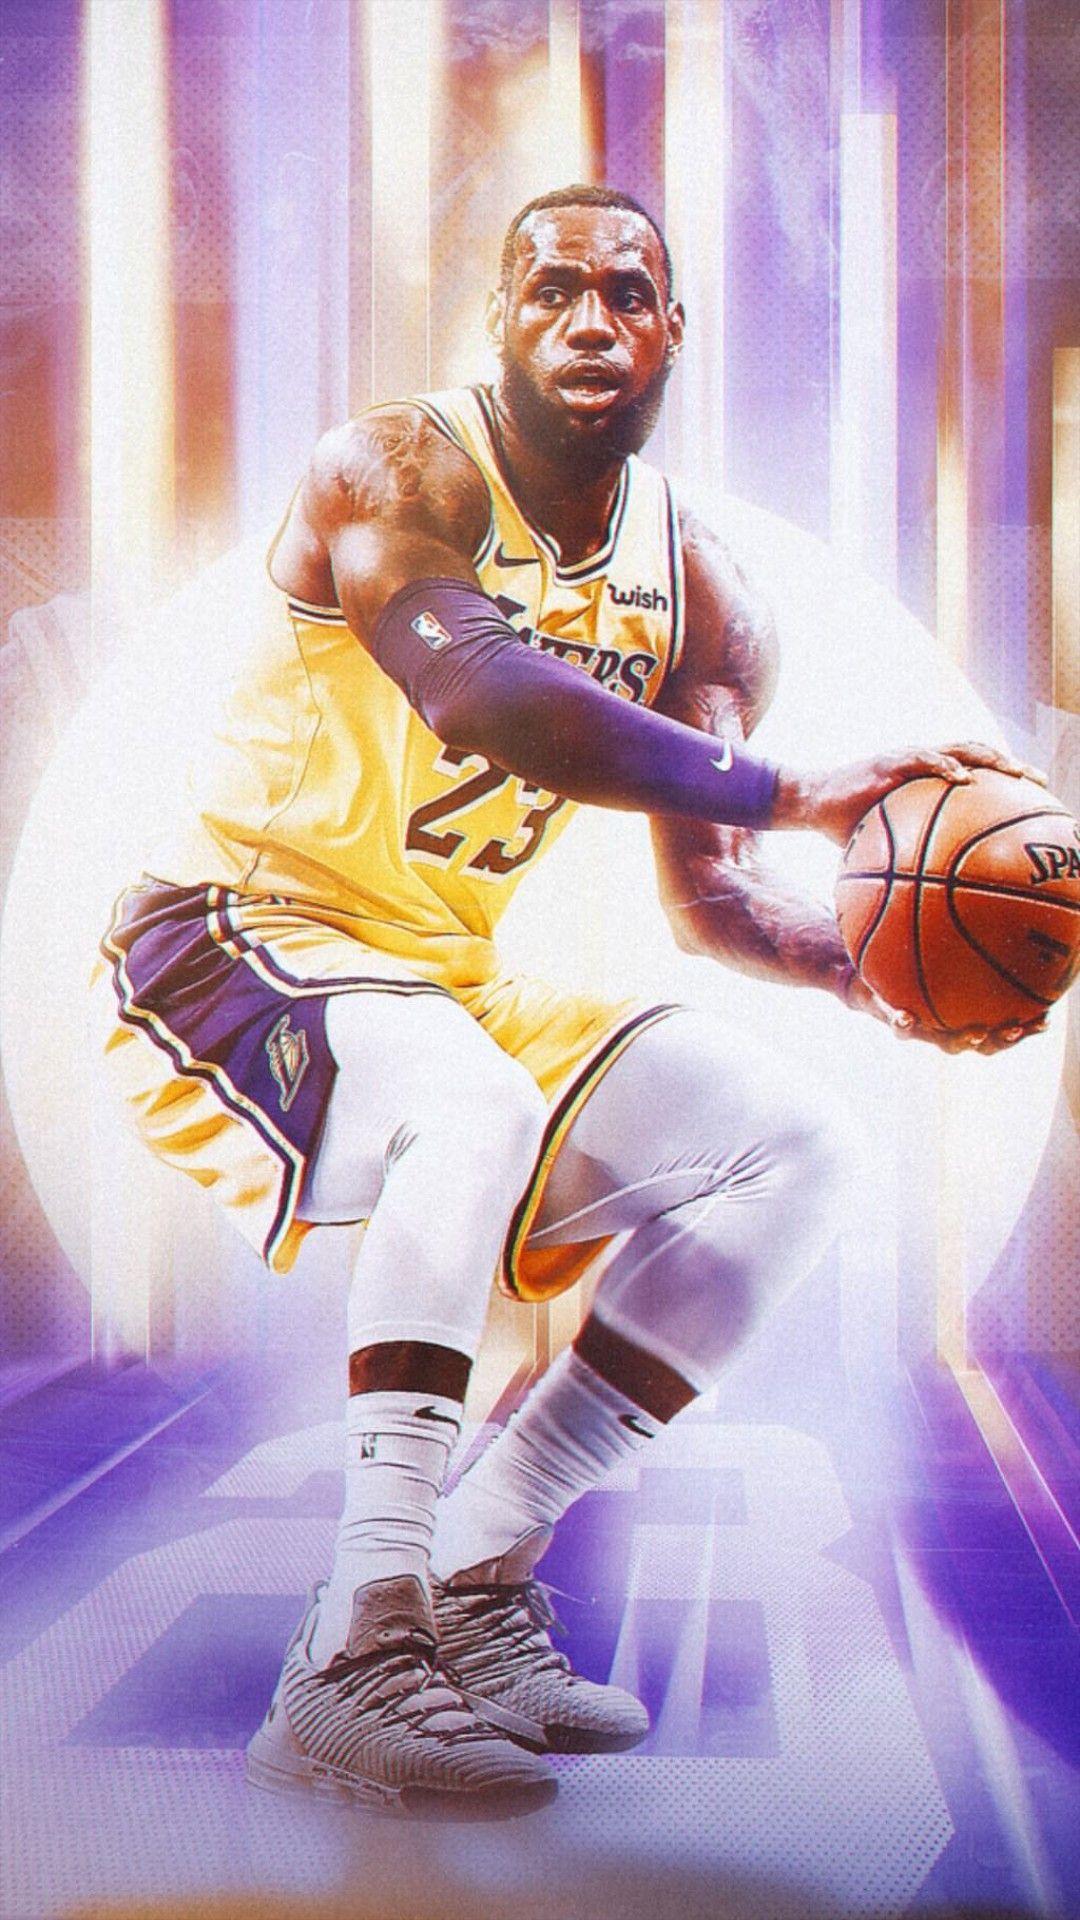 Lebron James La Lakers Wallpaper Lebron James Lakers King